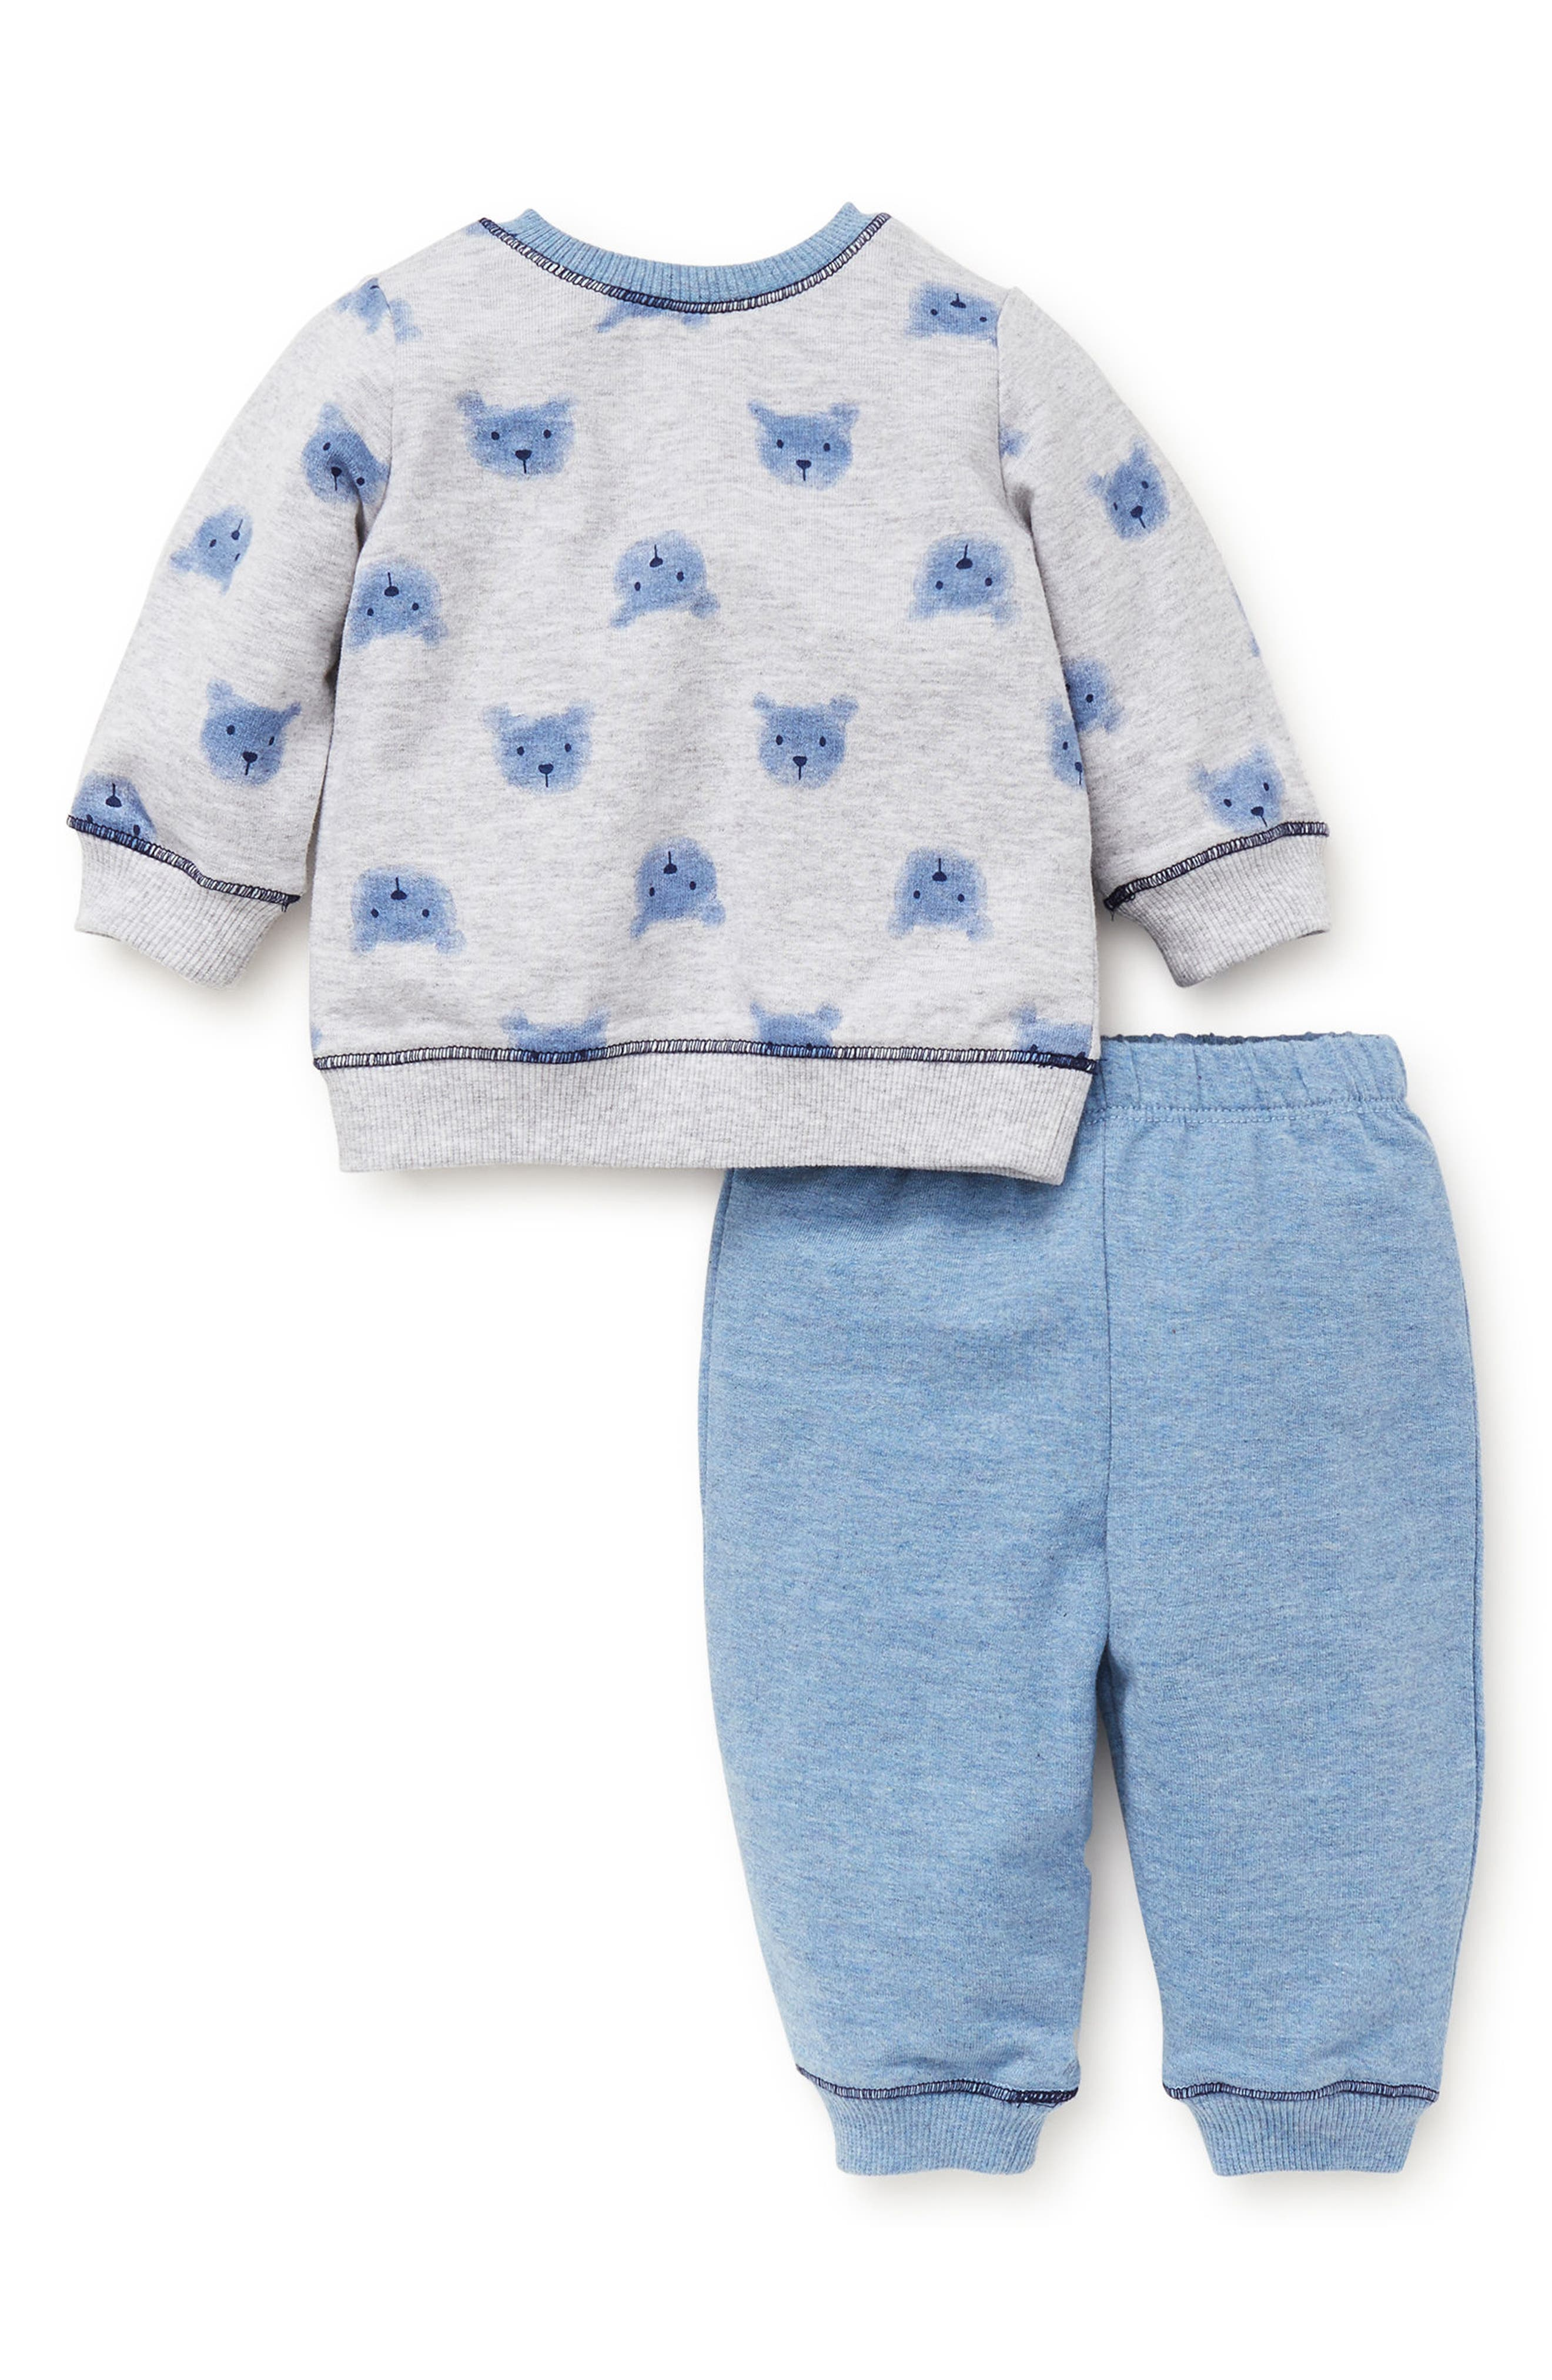 Bears Sweatshirt & Sweatpants Set,                             Alternate thumbnail 2, color,                             457